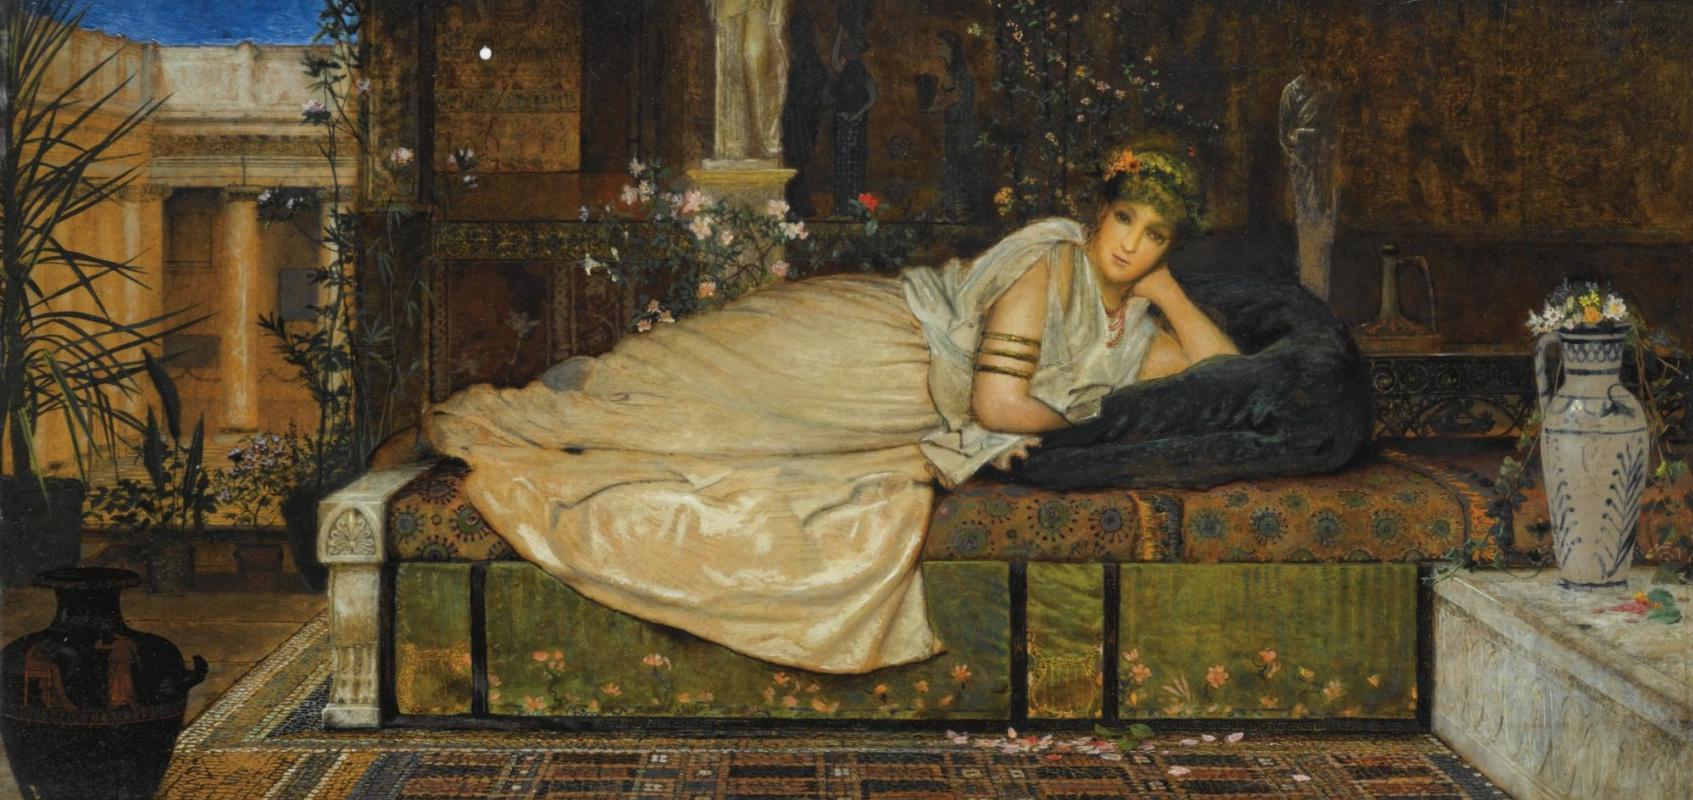 John Atkinson Grimshaw. Woman in a classic interior